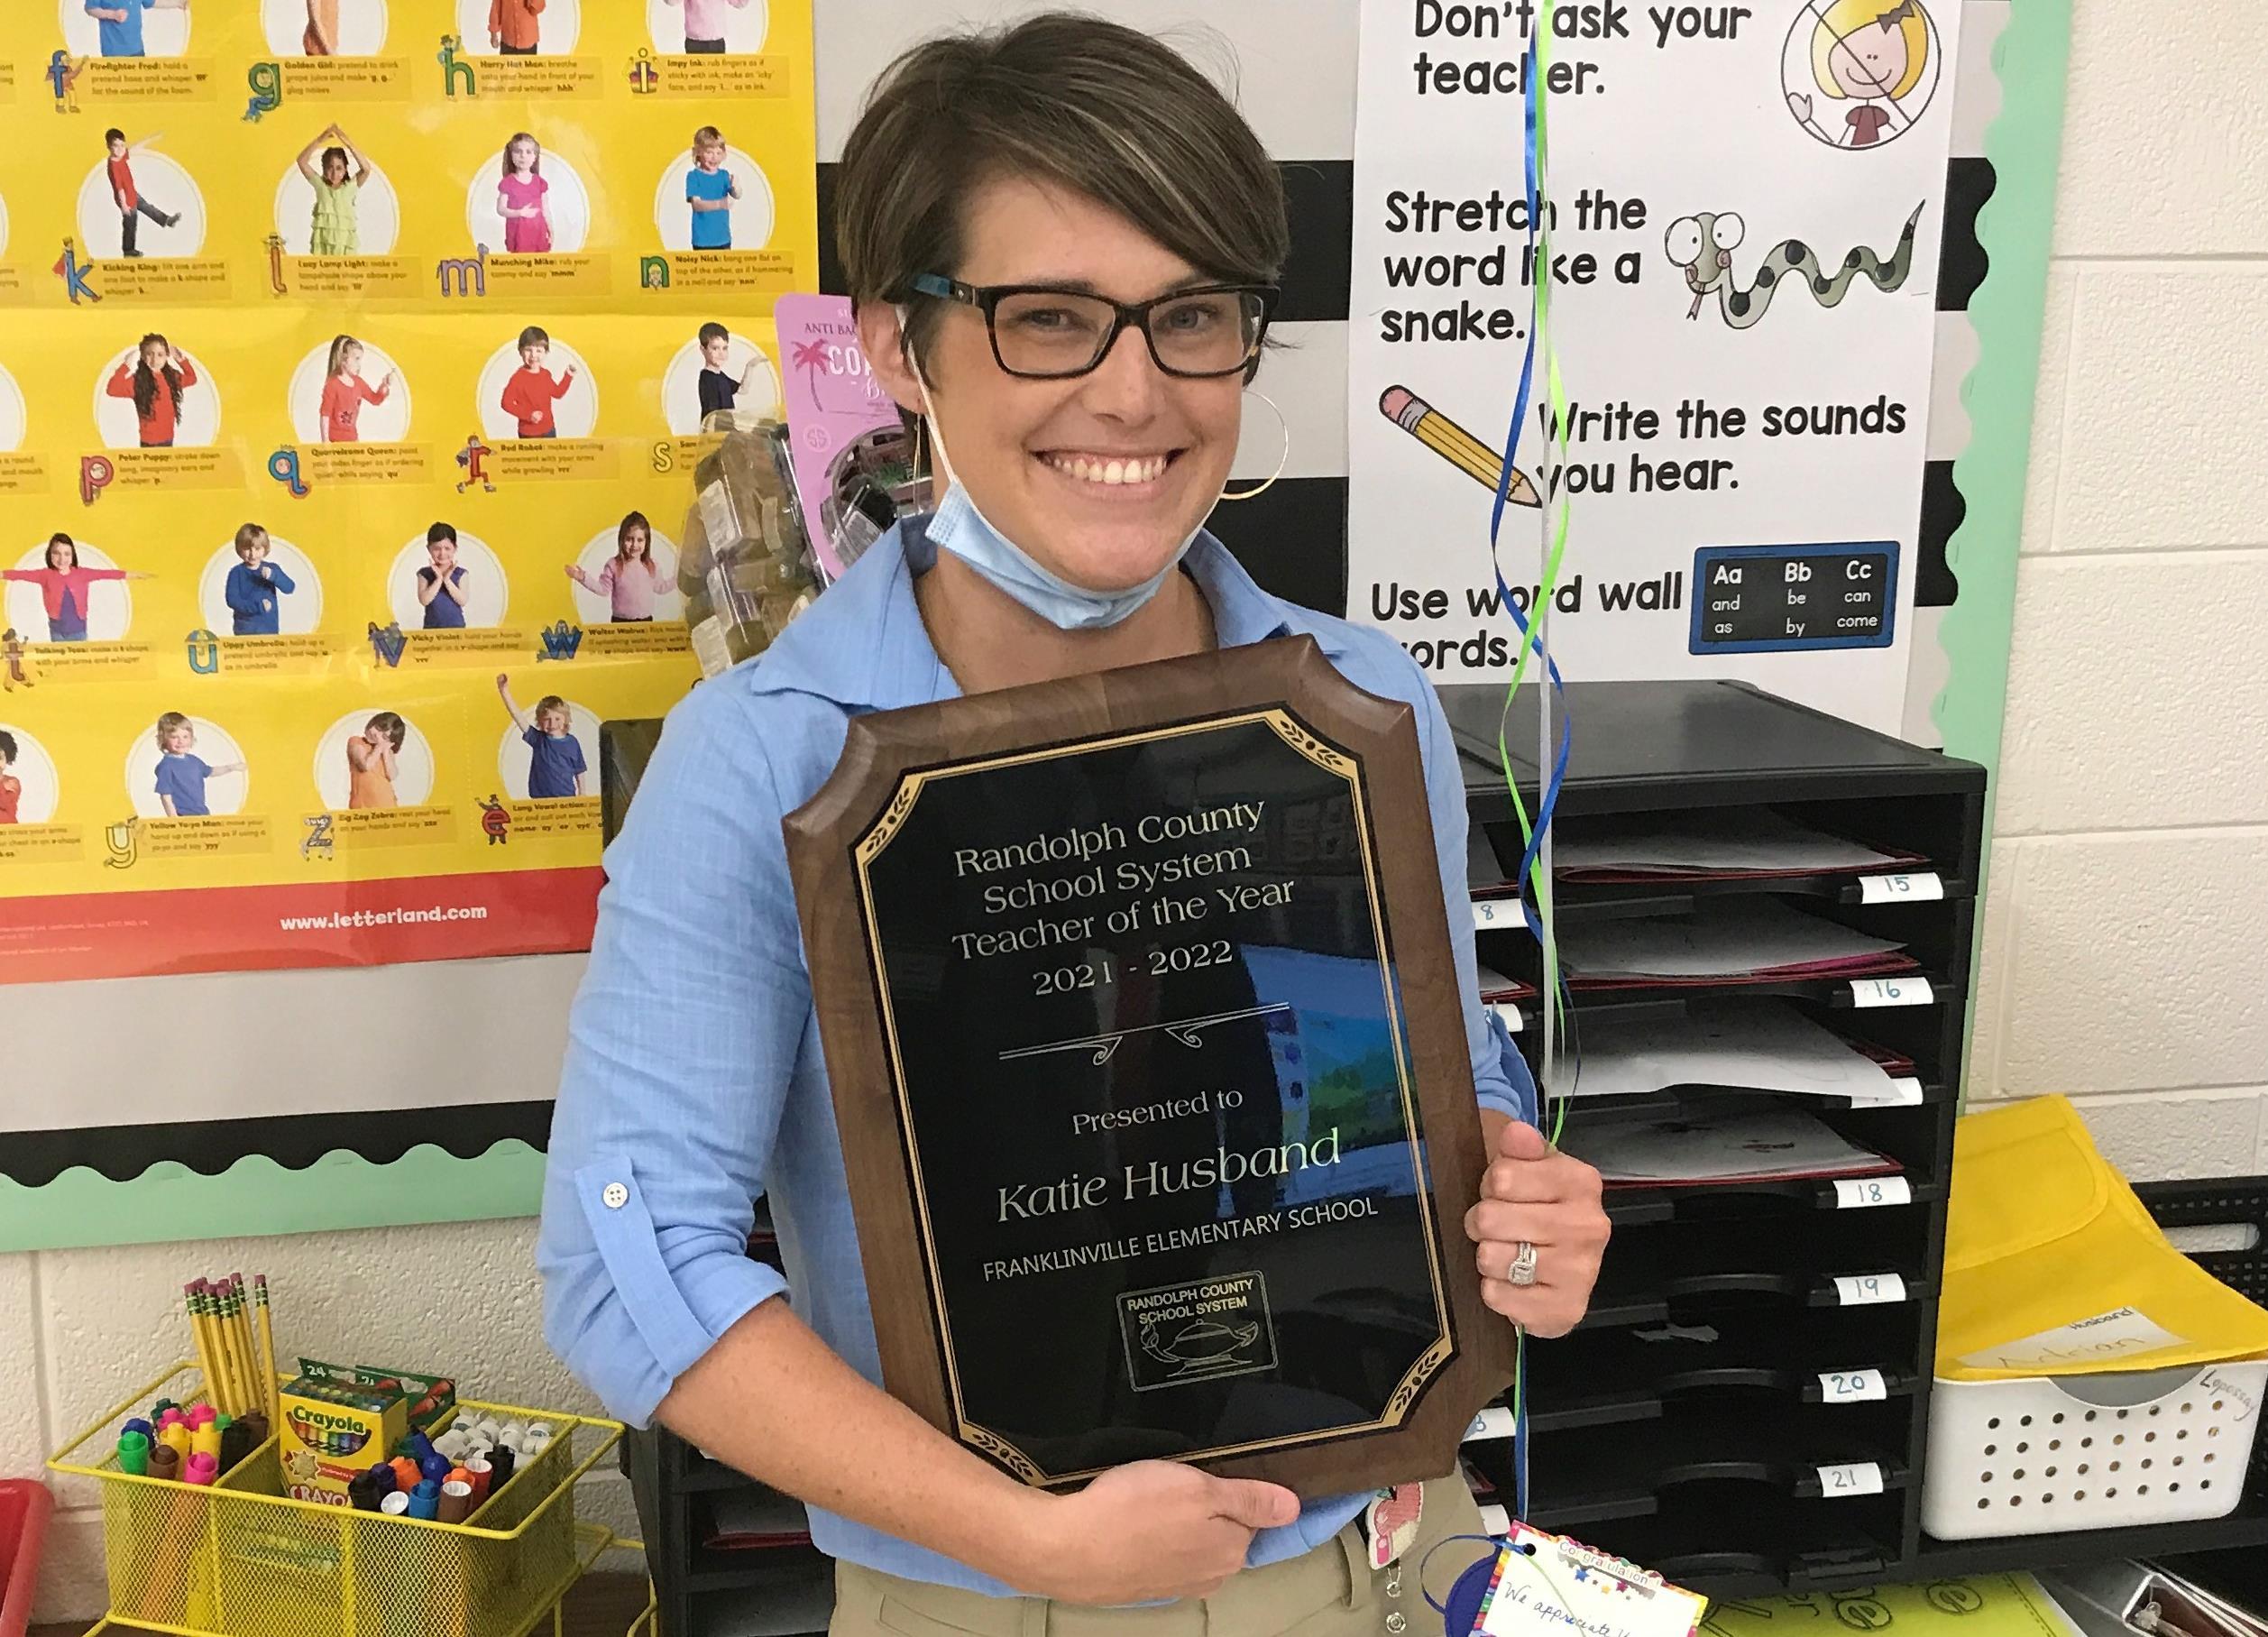 Katie Husband Teacher of the Year 2021-2022